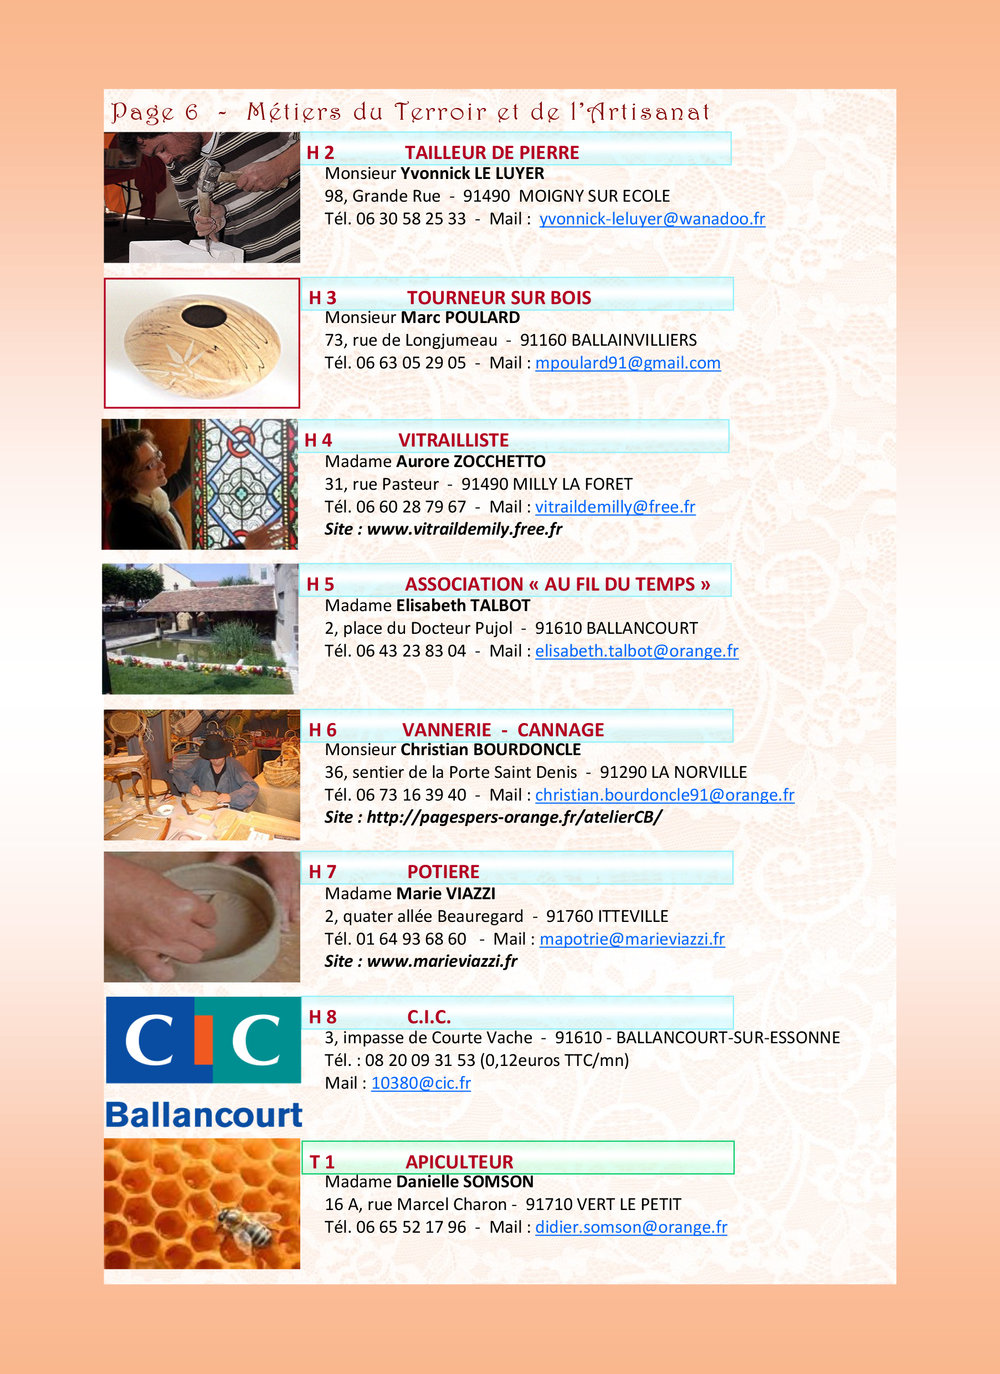 Livret 2013 (24 juillet)-6.jpg